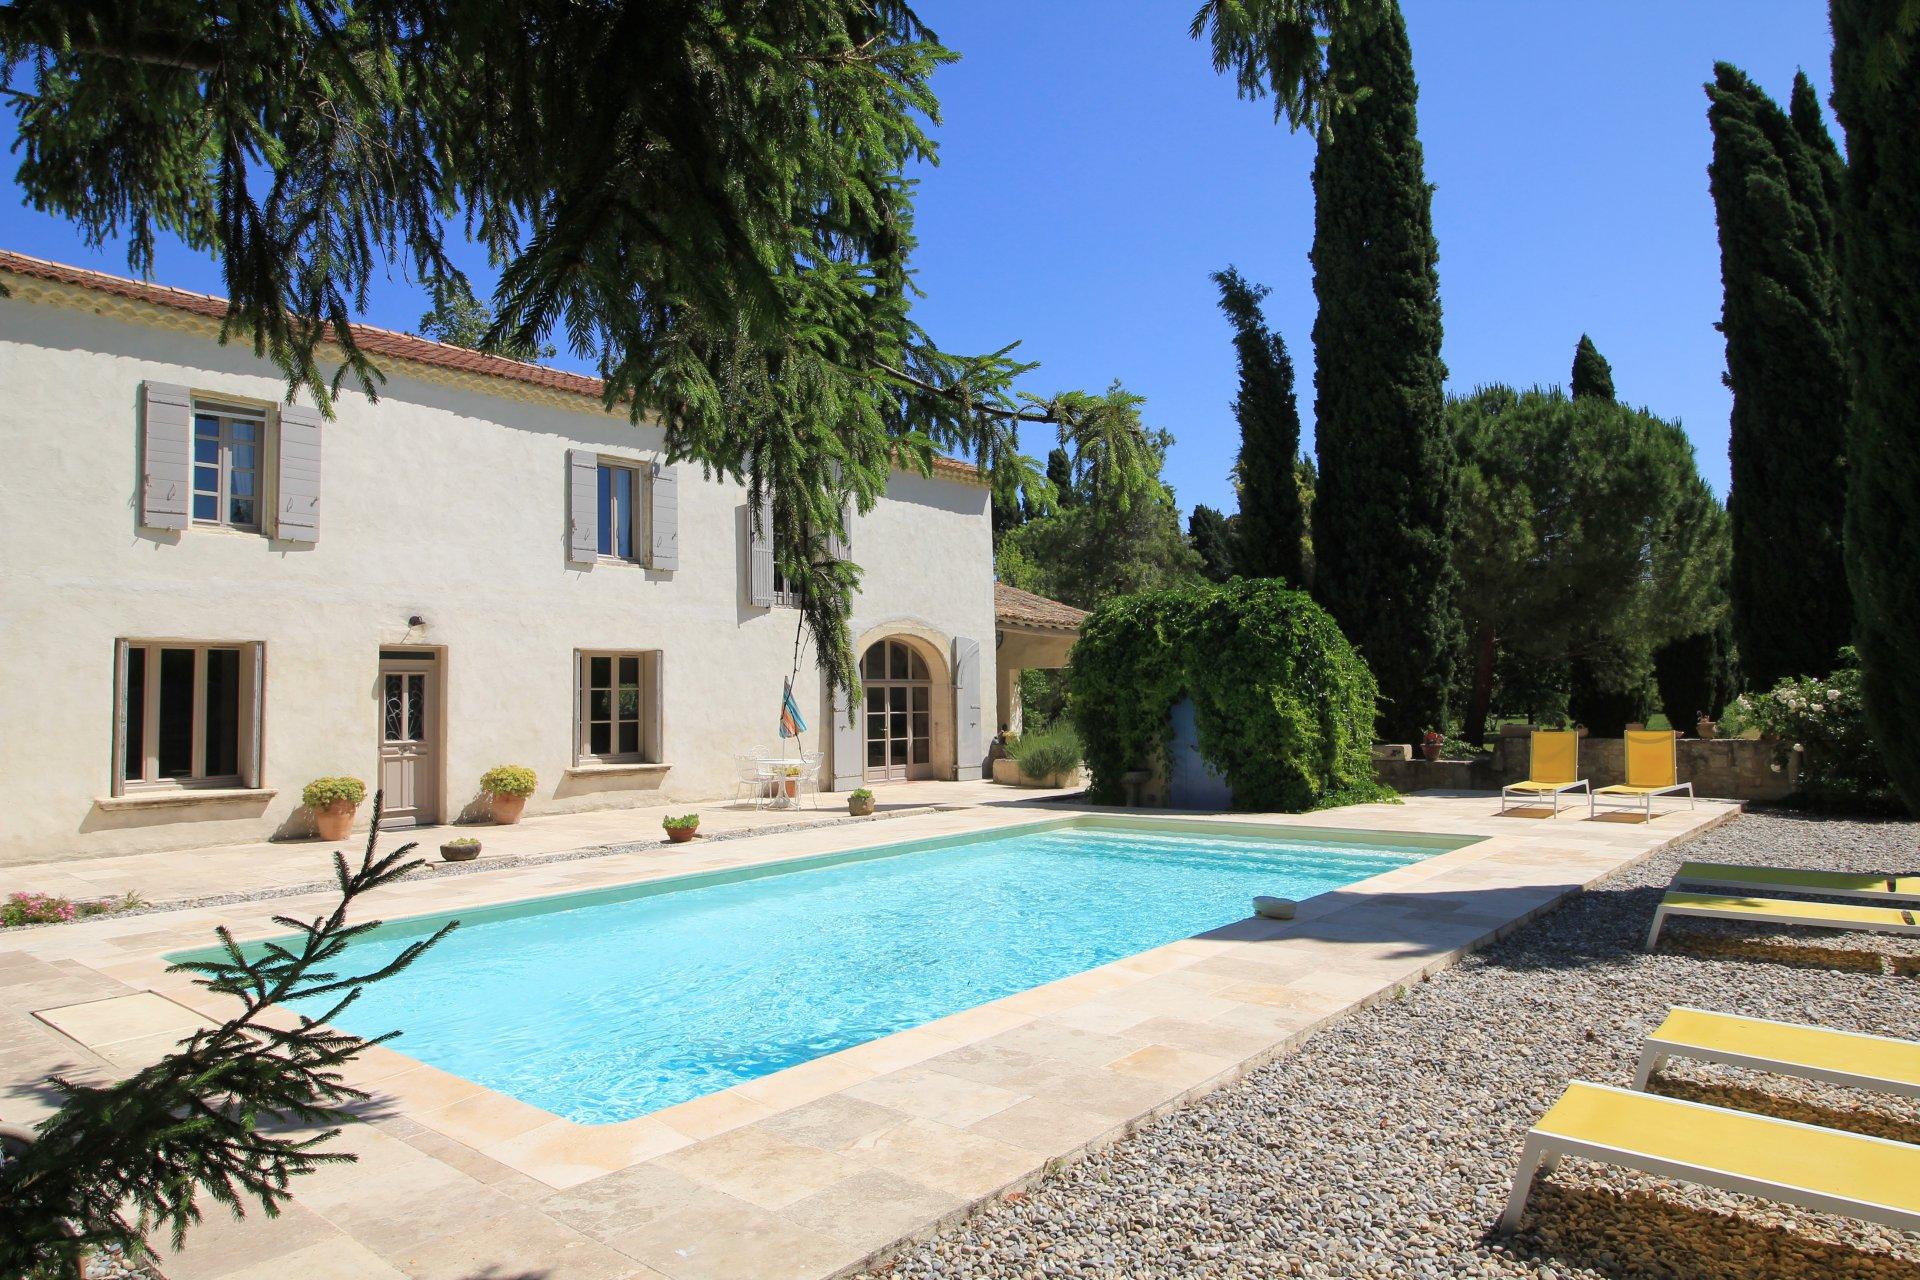 Vente Mas 4 chambres et piscine proche Alpilles